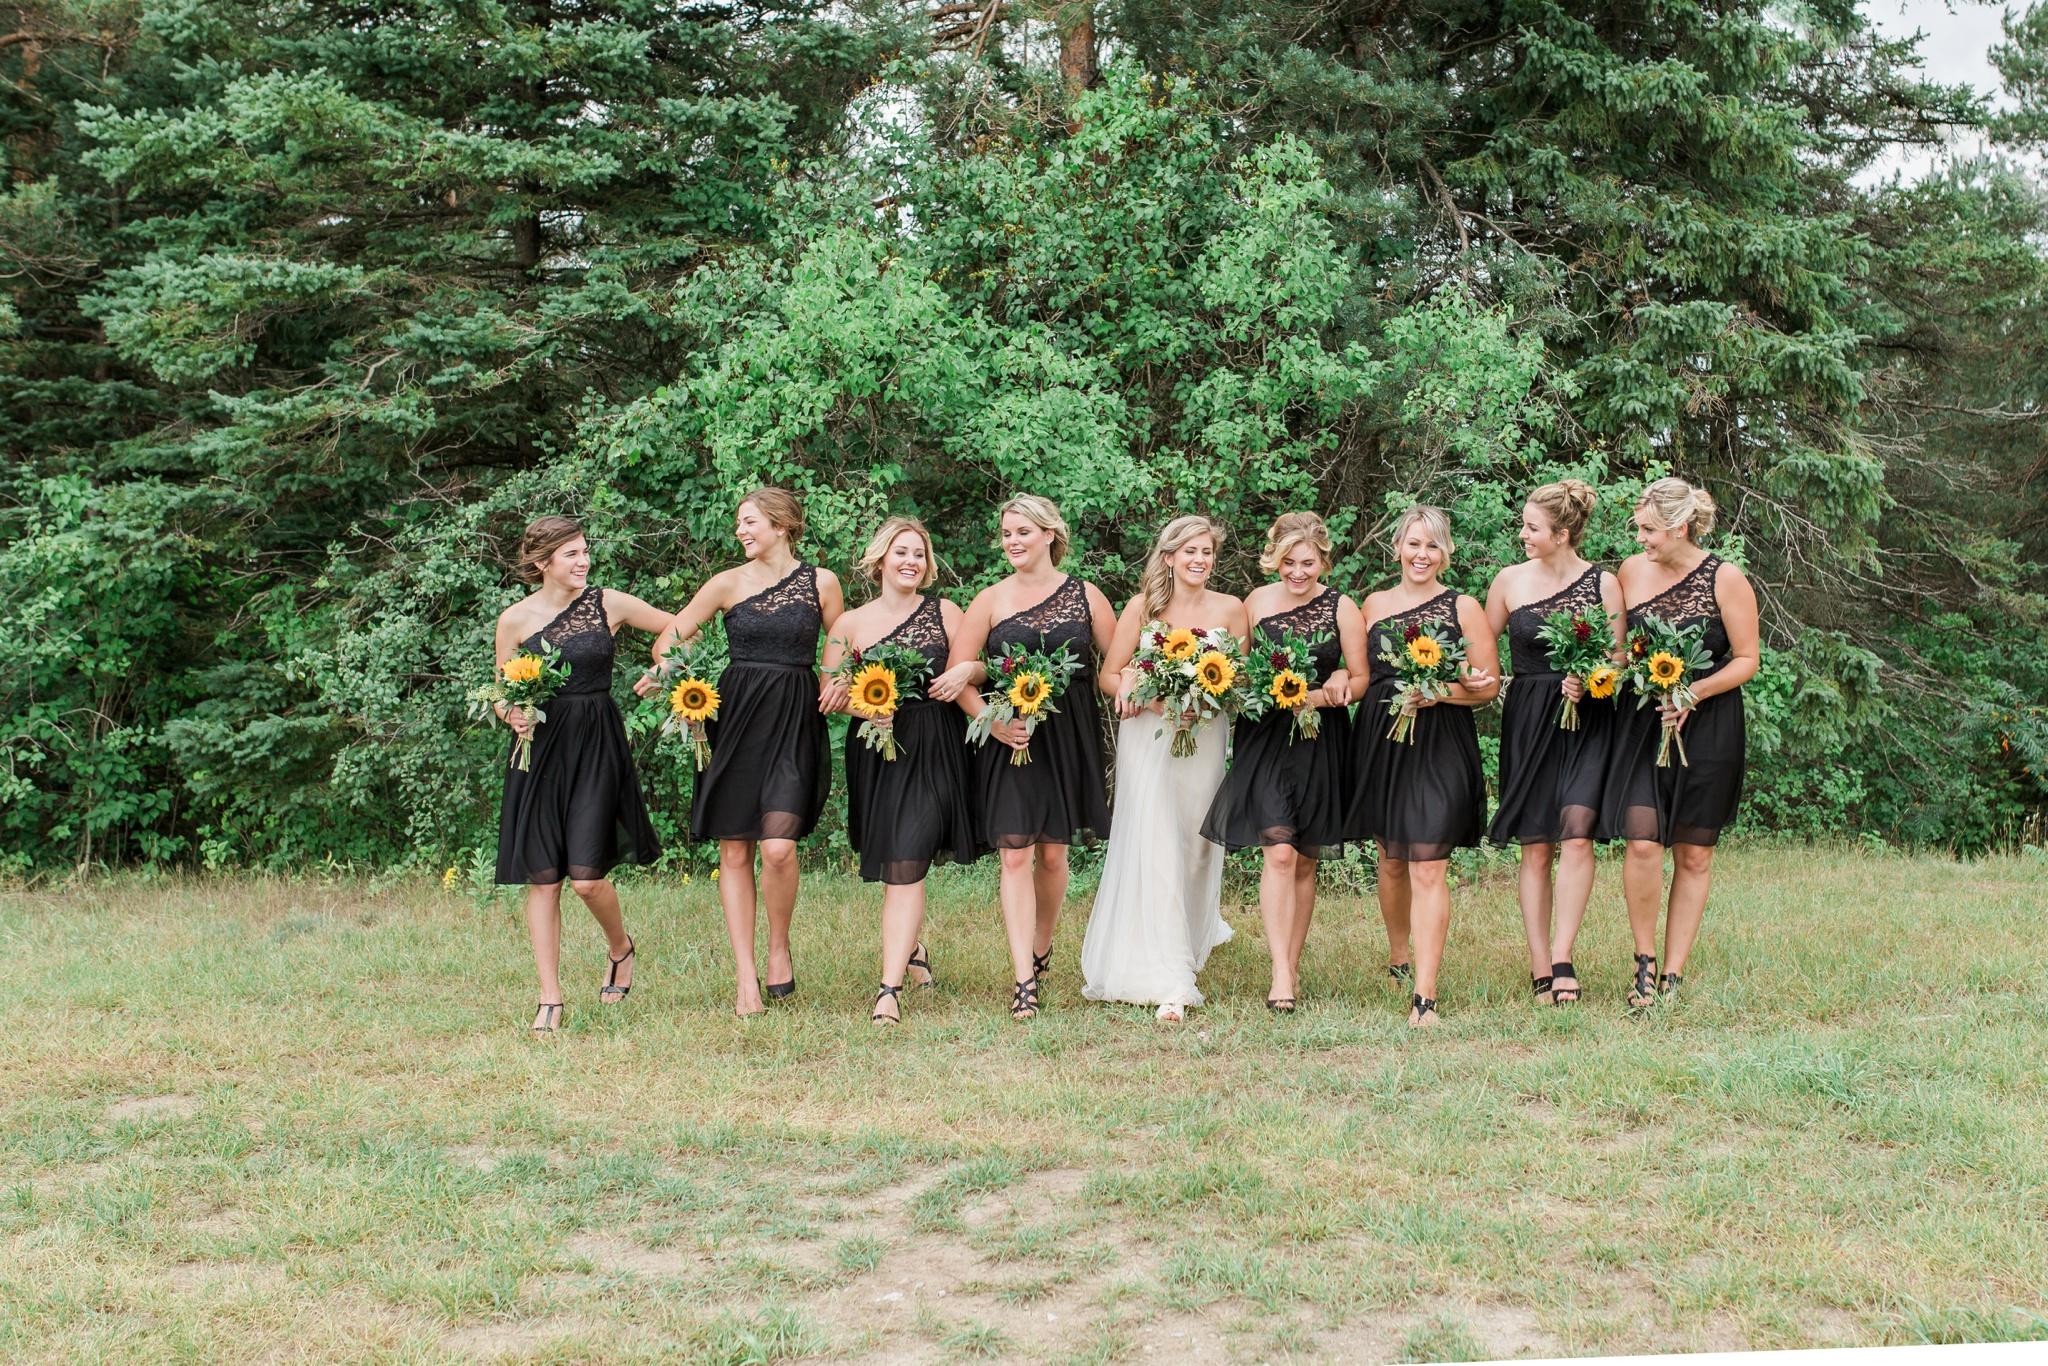 Black Bridesmaid Dress, Sunflower Bouquet